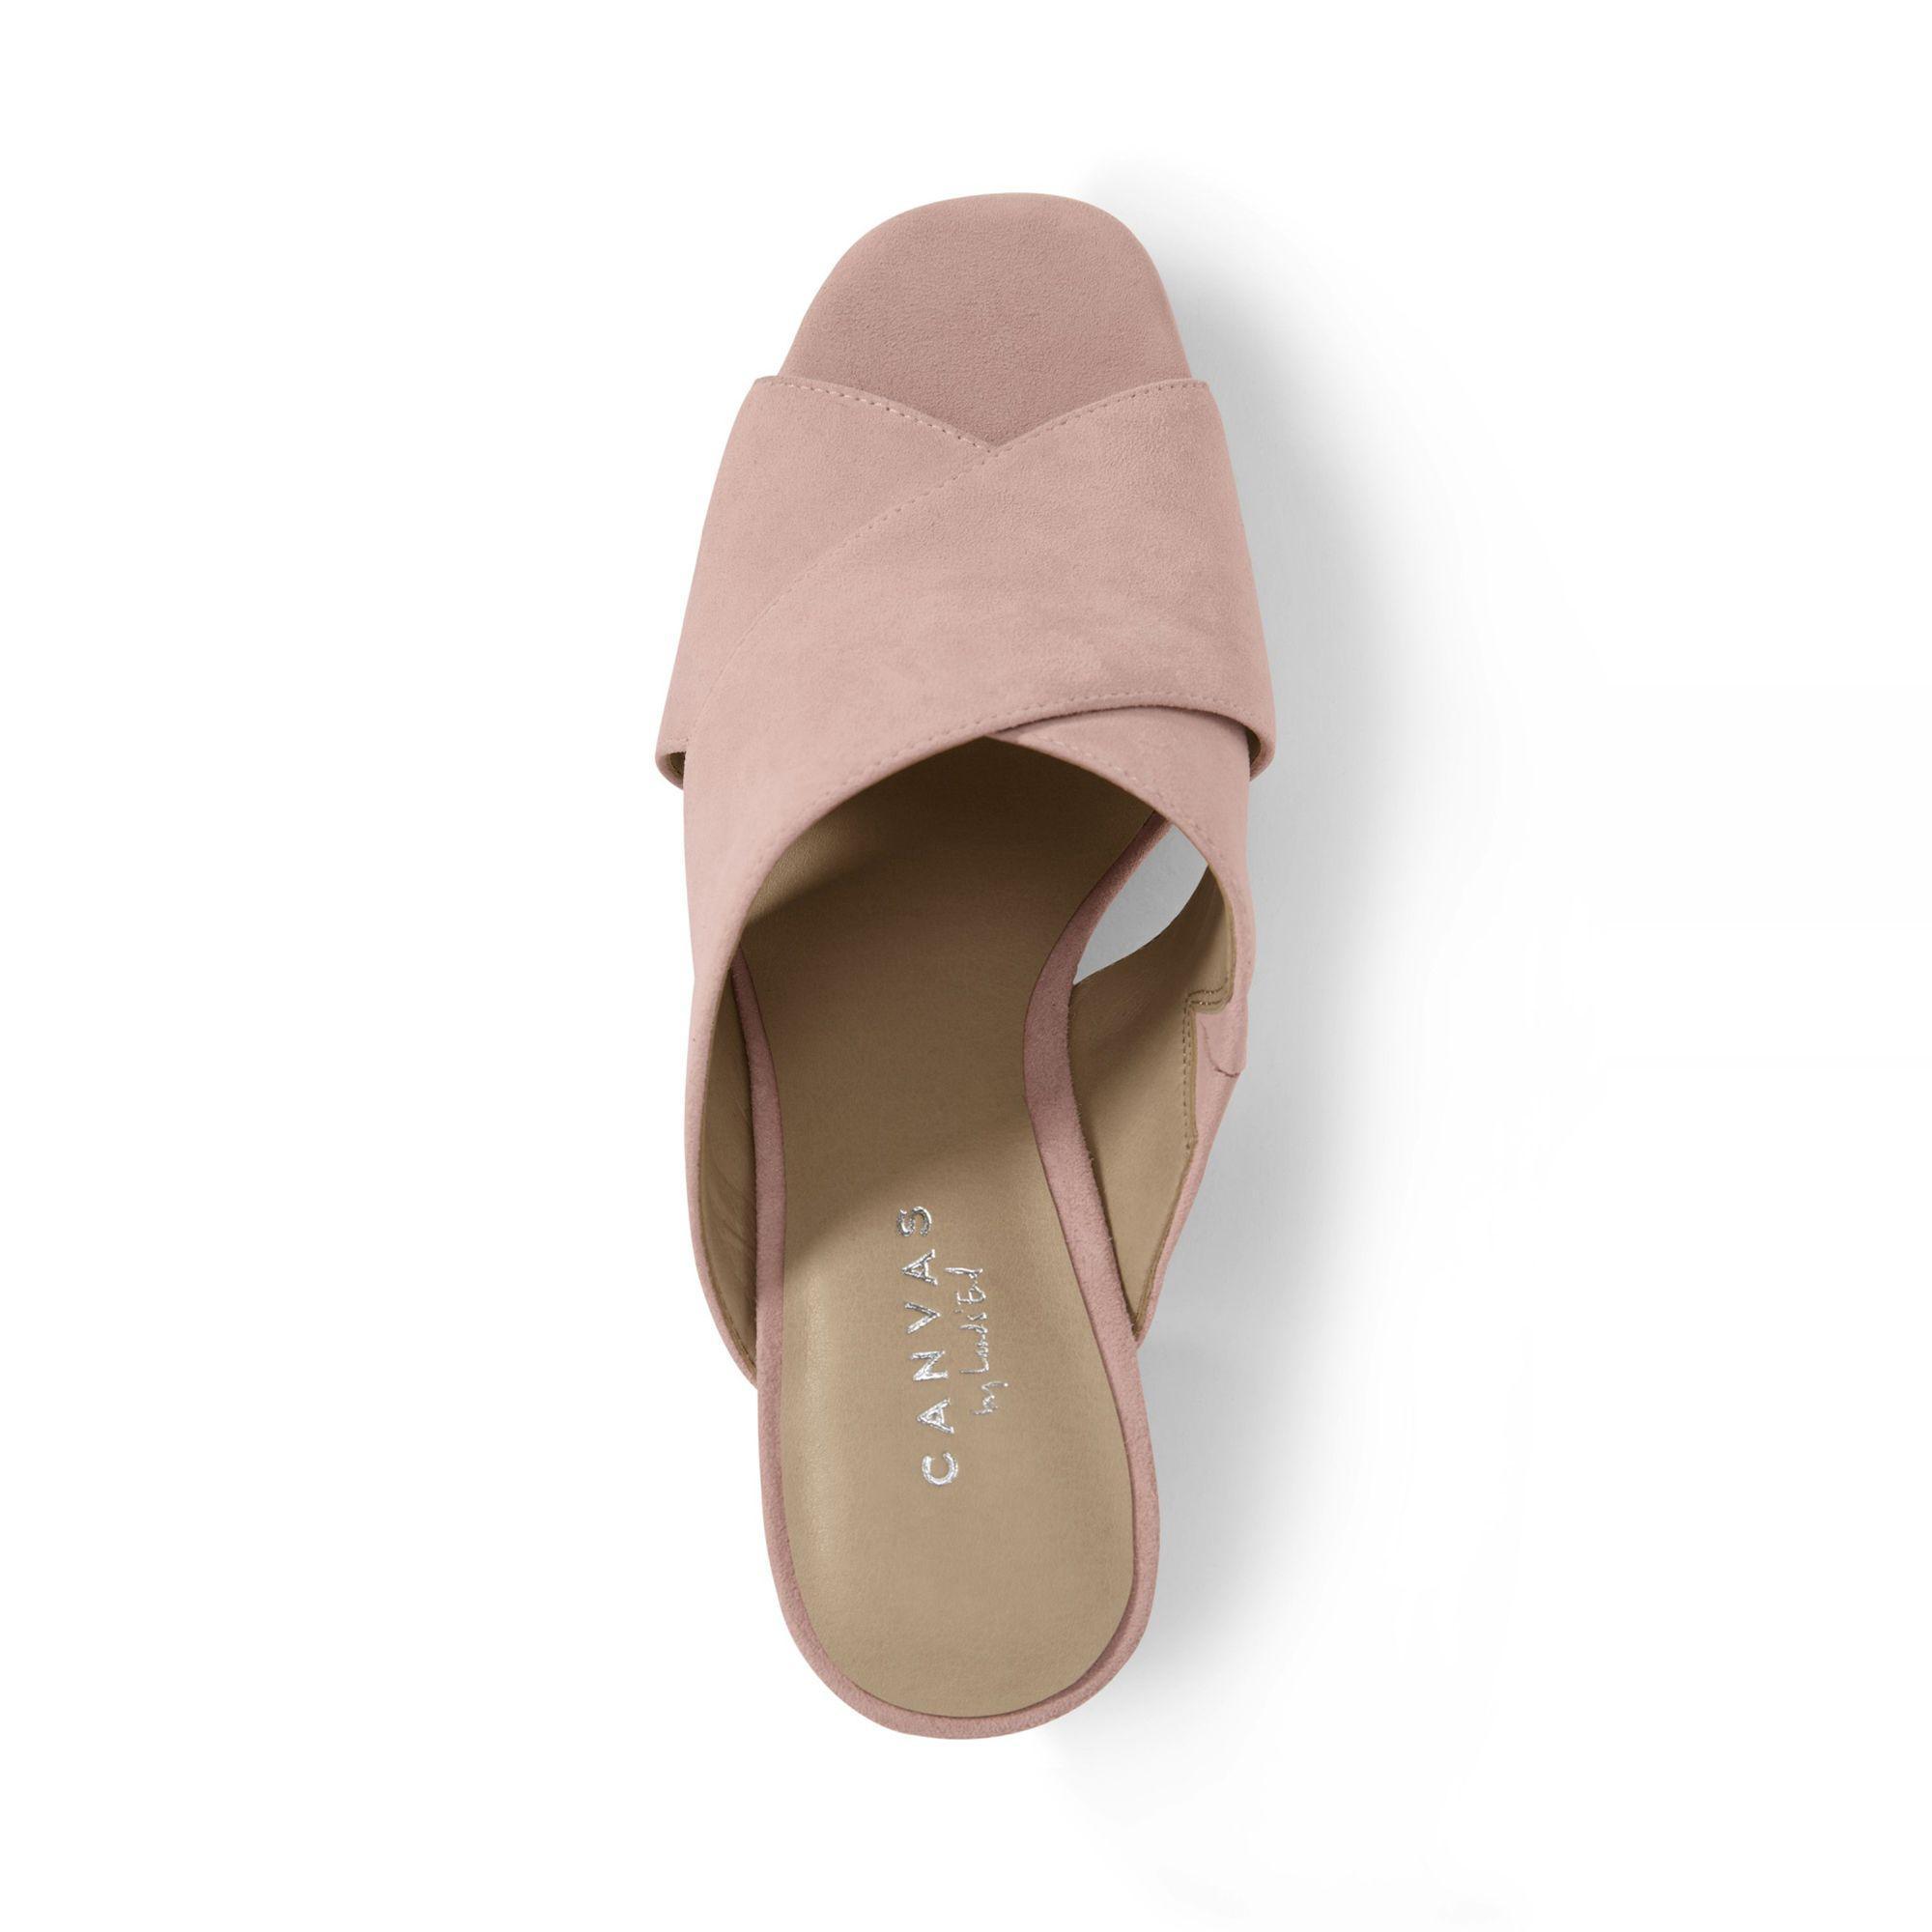 0fef1c02b1c Lands  End Pink Regular Crossover Suede Mule Sandals in Pink - Lyst